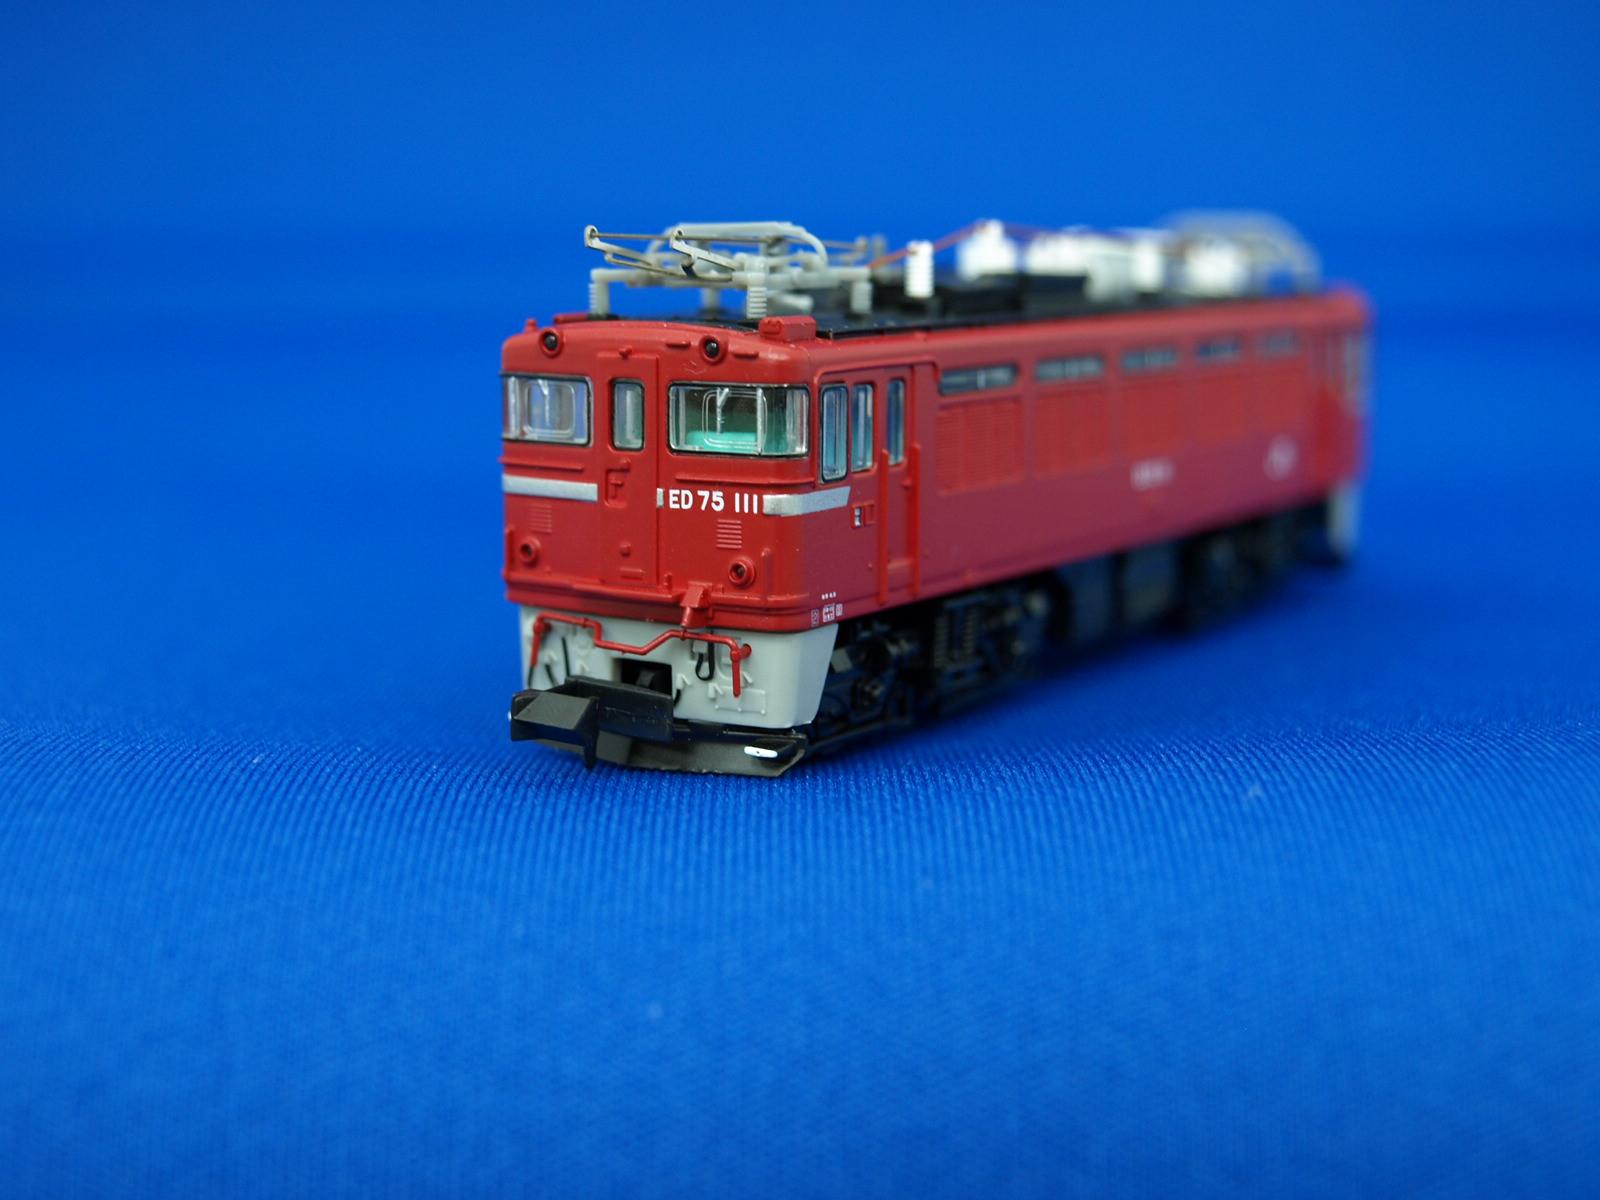 Nゲージ マイクロエース A8139 ED75-111・仙台総合鉄道部